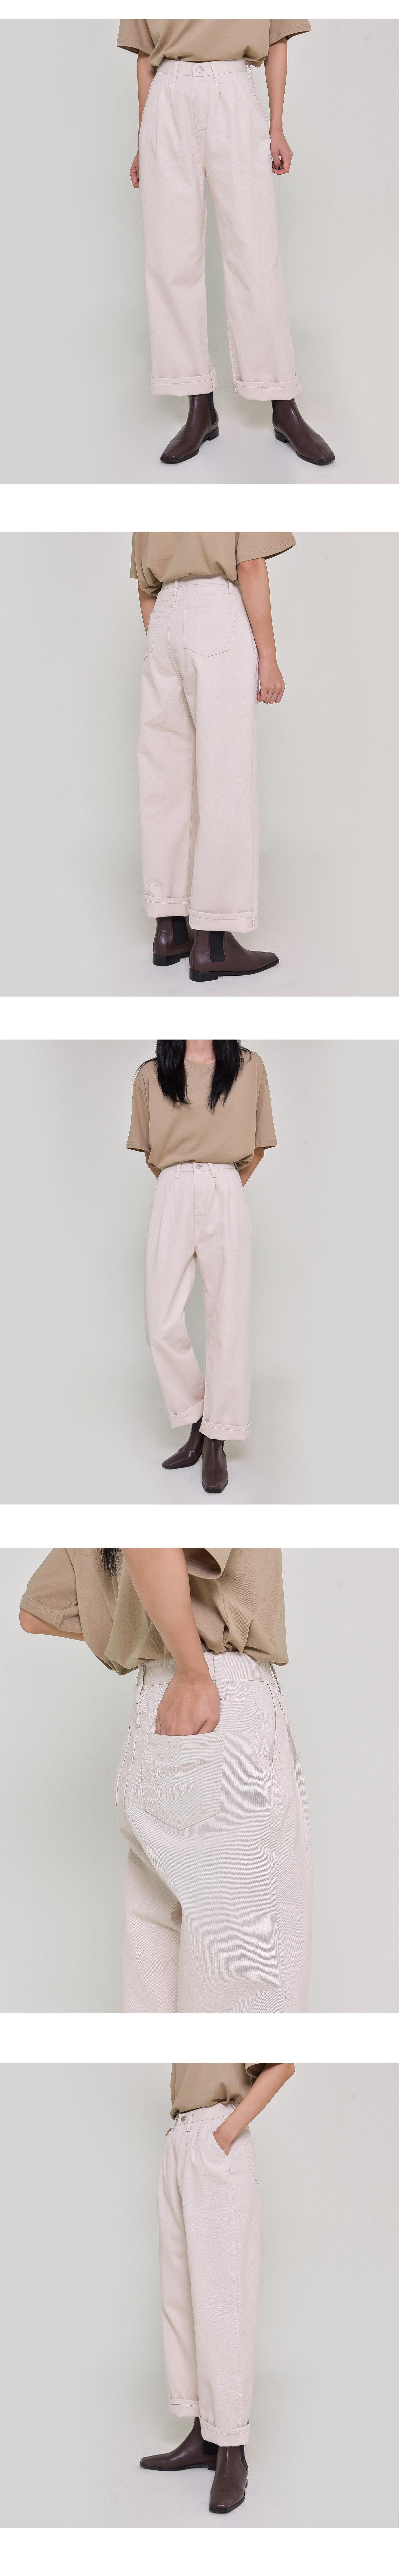 Nudy pintuck trousers